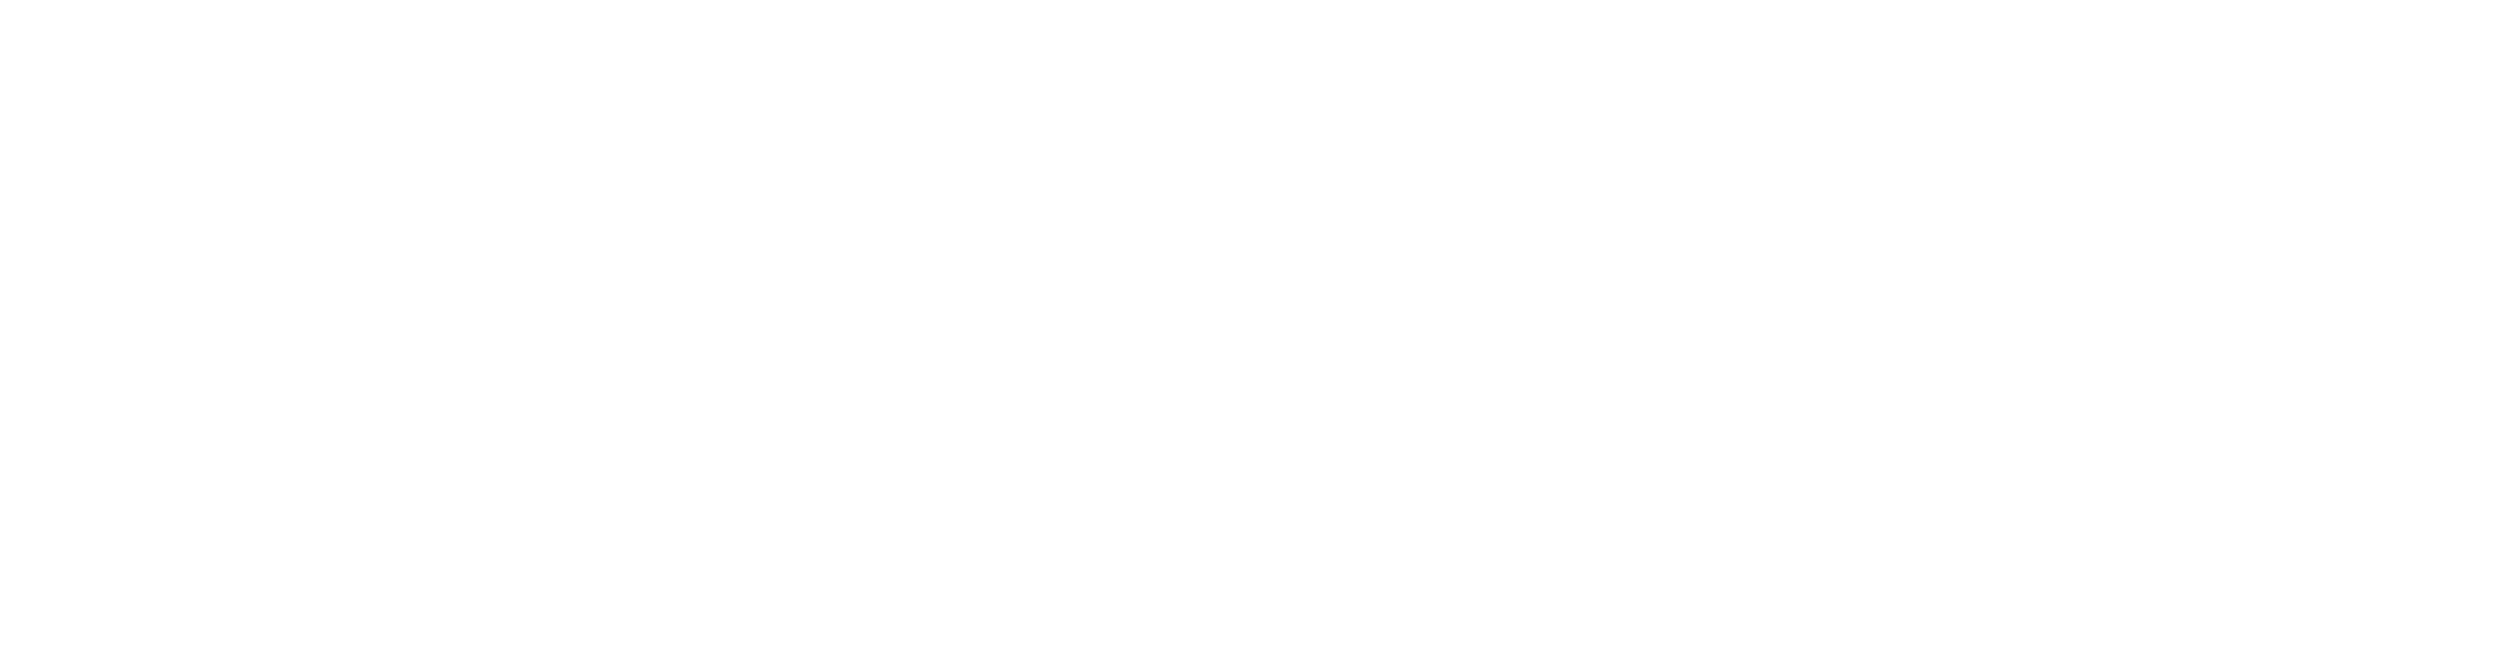 ATFLongCorrectWhite.png